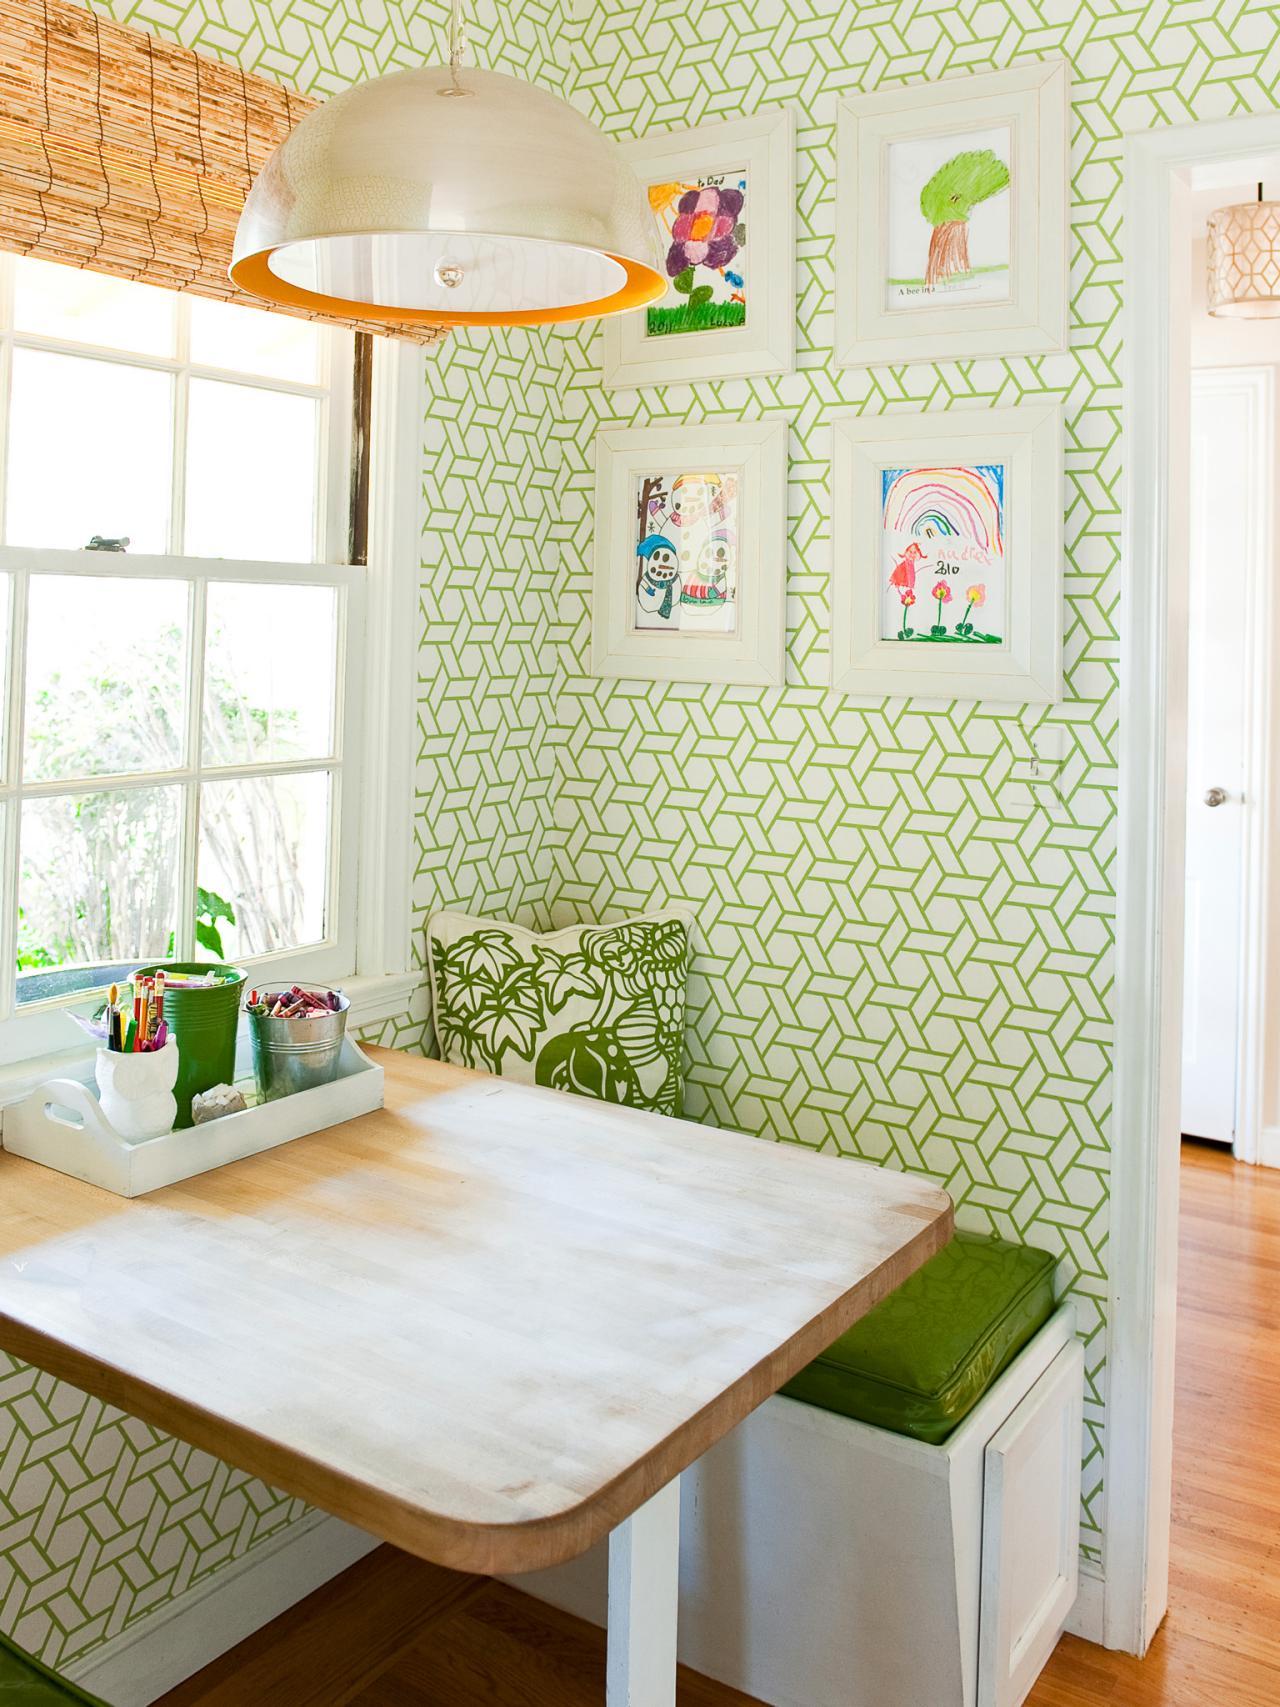 White kitchen with Retro Wallpaper photo - 8